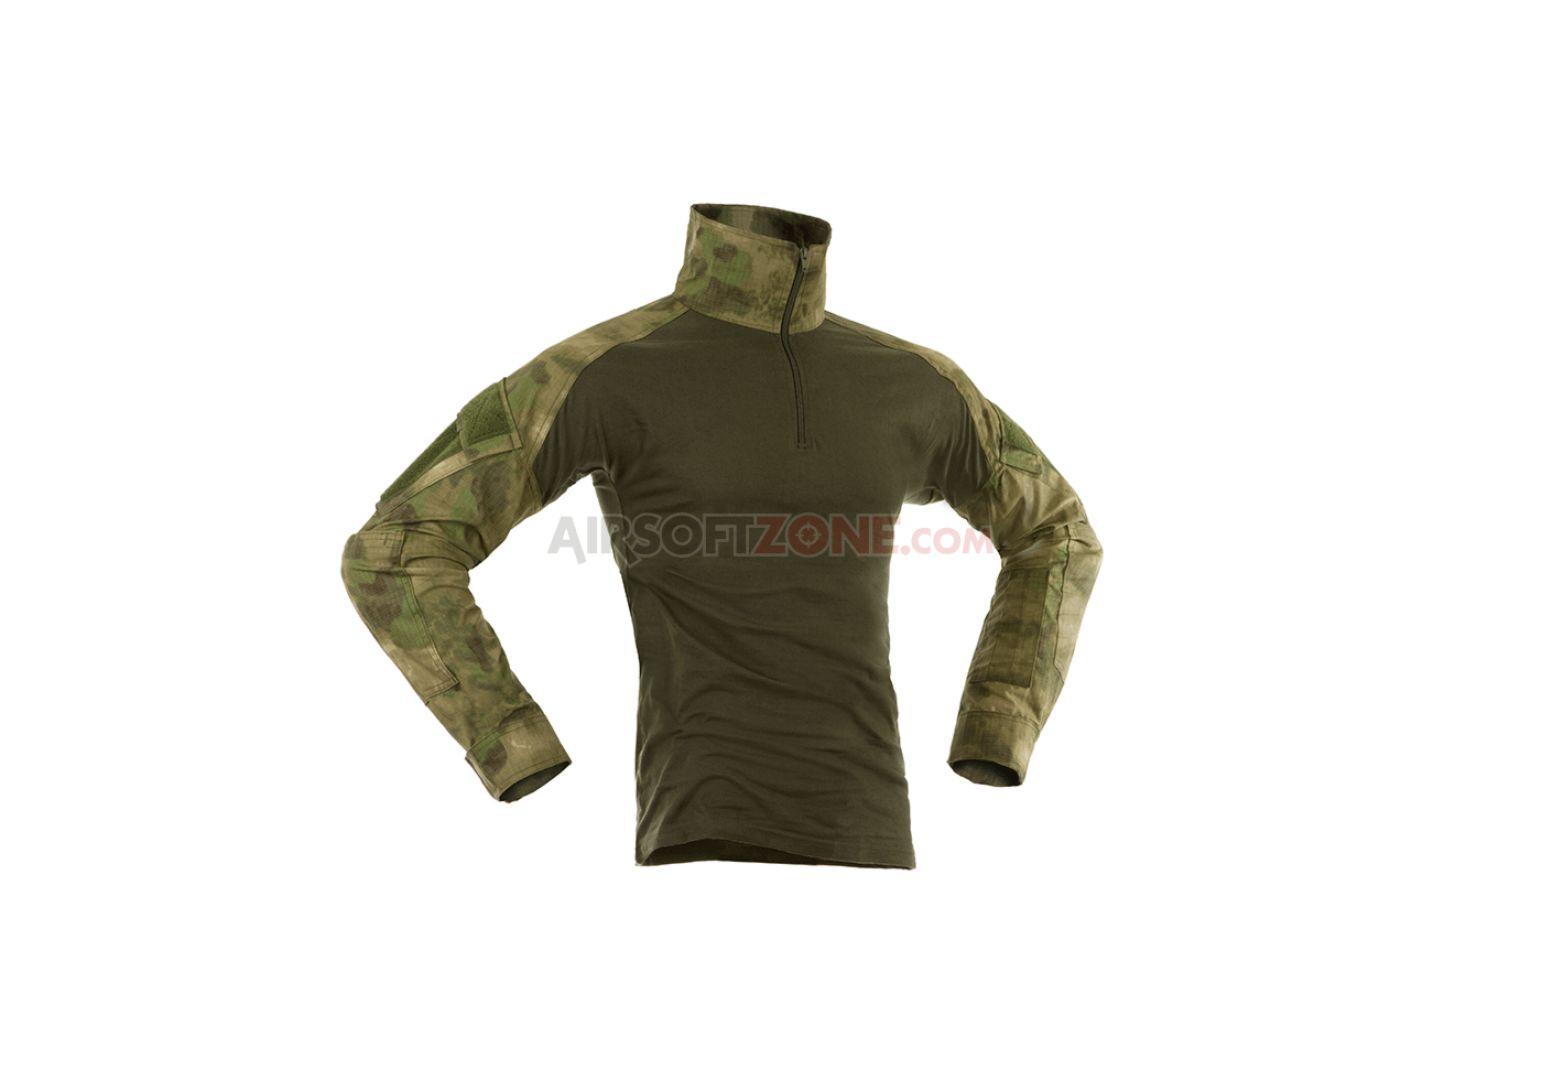 Combat shirt Everglade A-tacs fg style